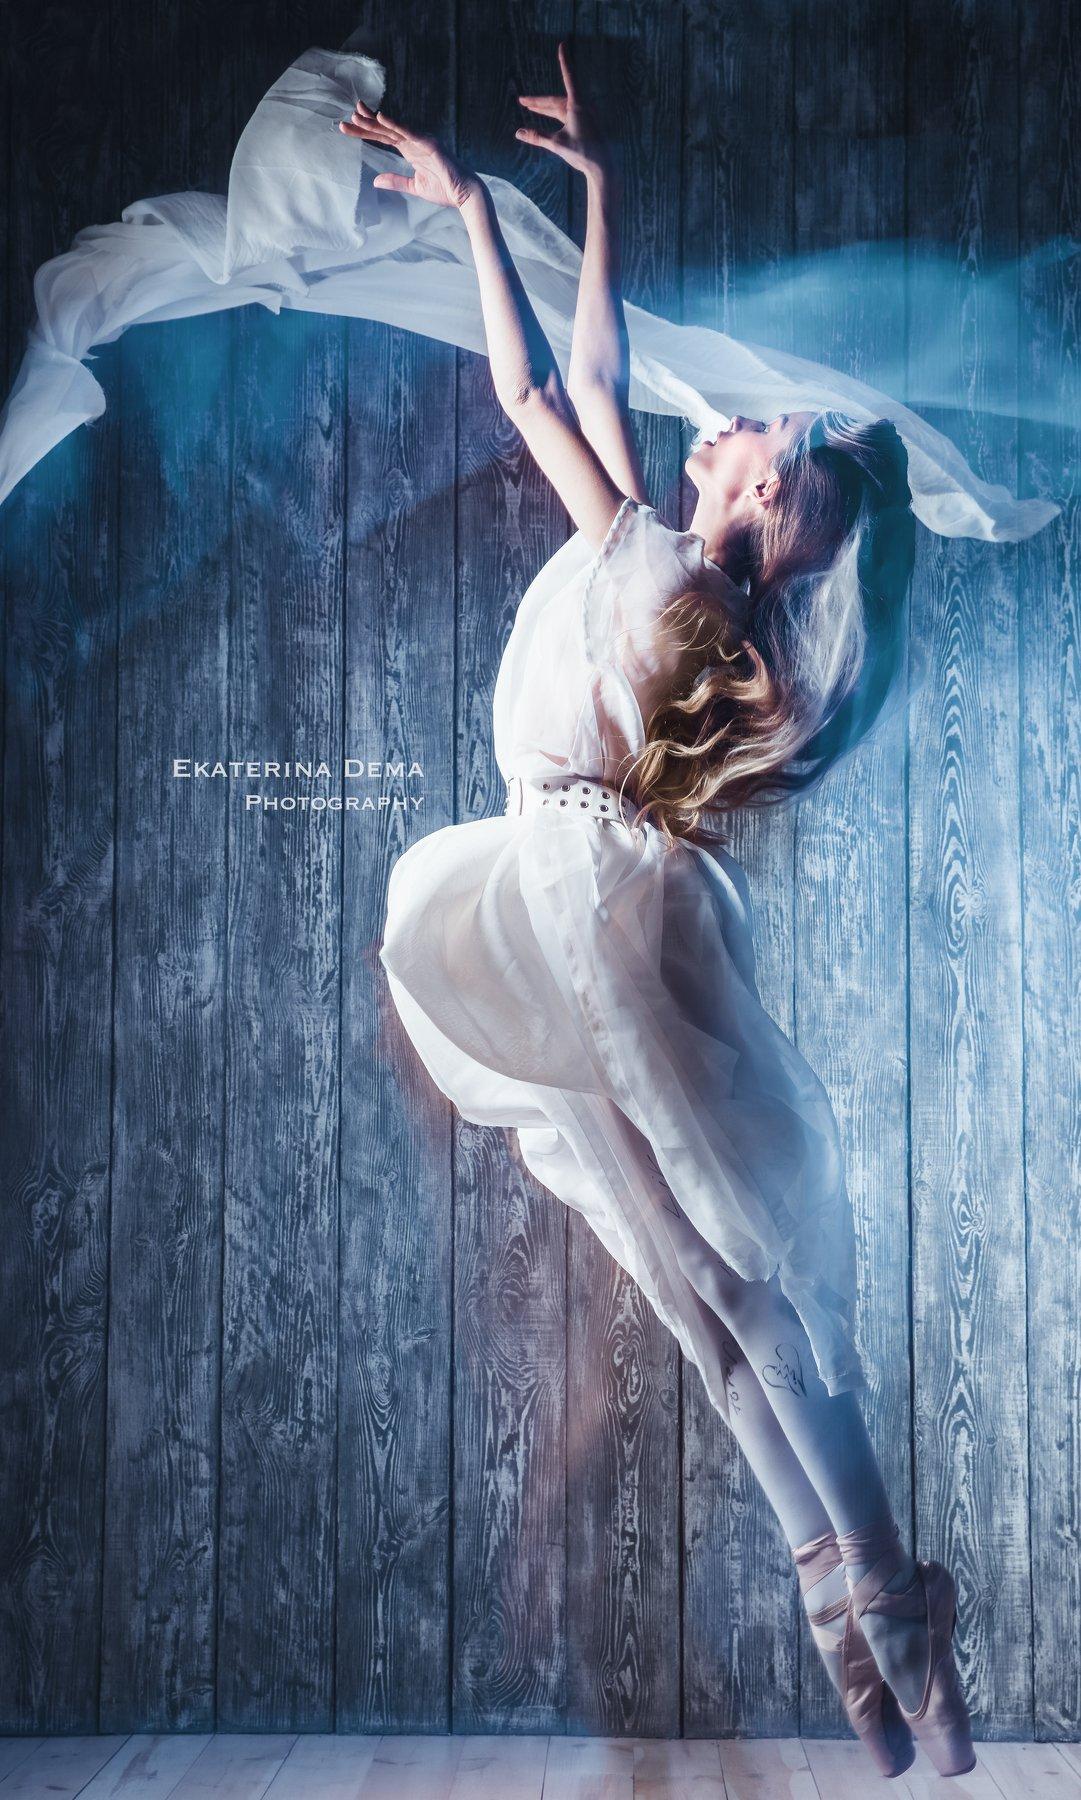 ballerina, fly, fashion, winter, snow, ice, cold, breathe, vintage , Ekaterina Dema